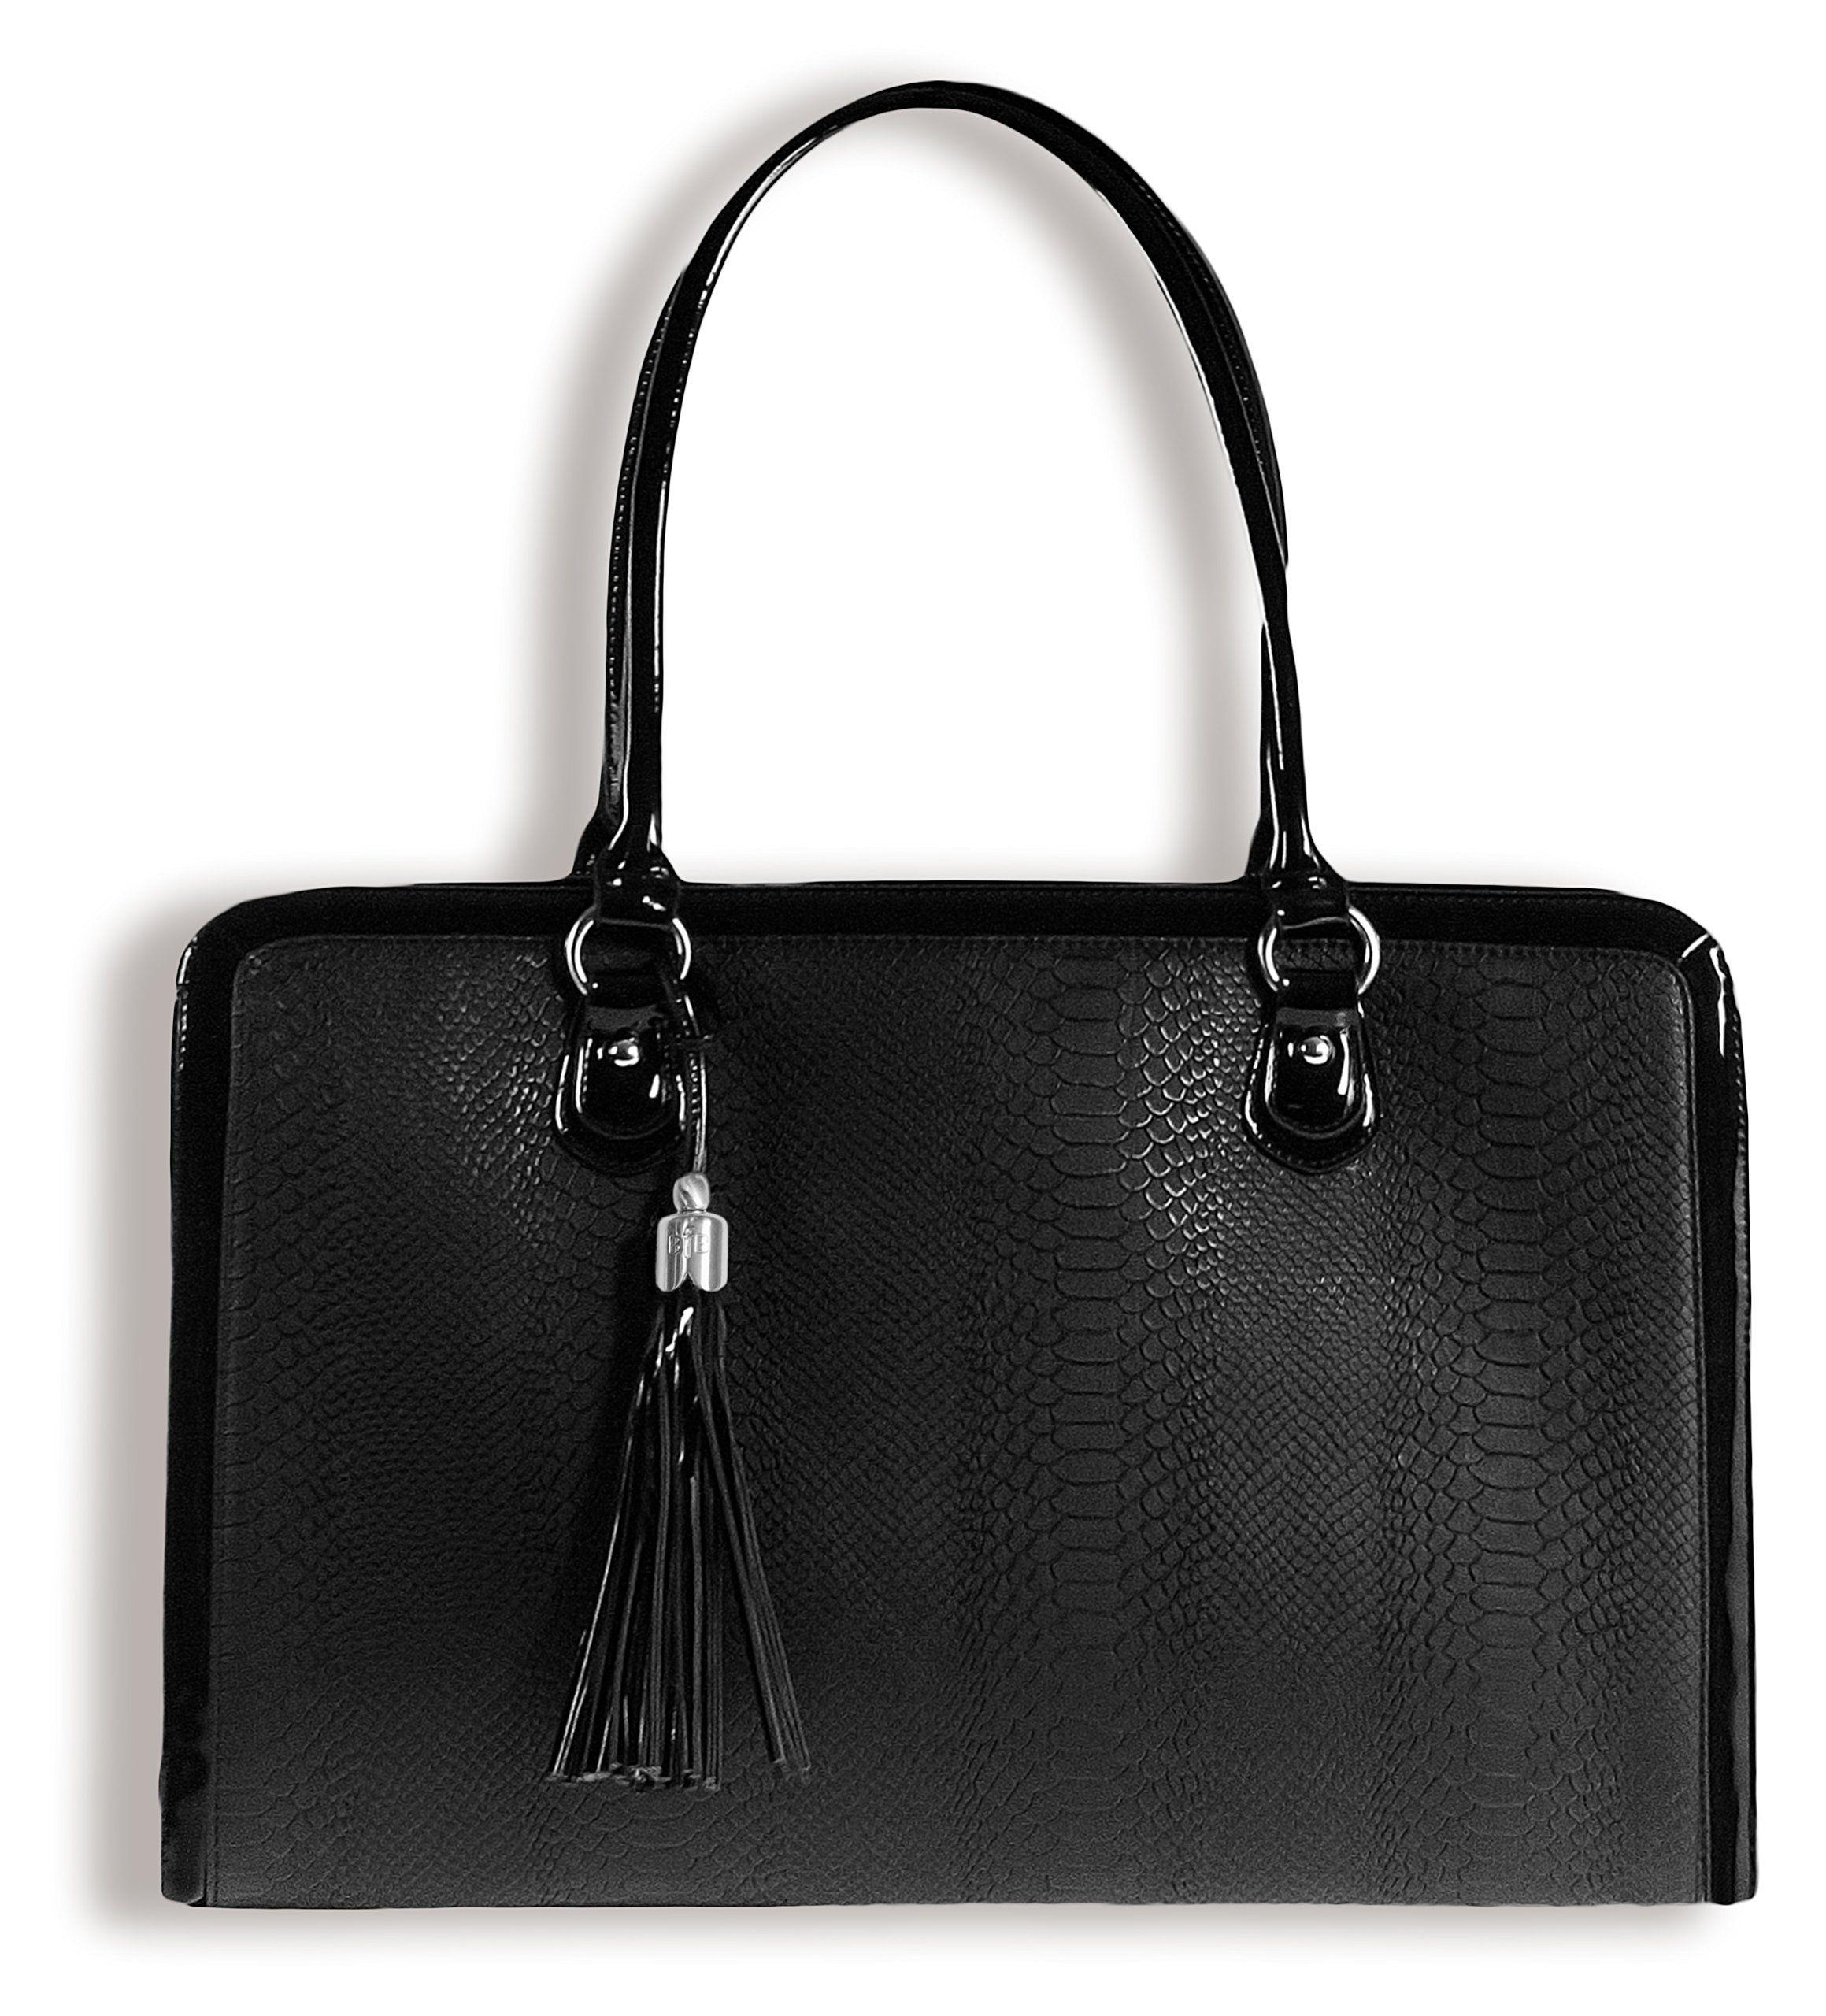 Bfb Laptop Bag For Women Handmade Designer Briefcase Messenger 17 Inch Computer Black